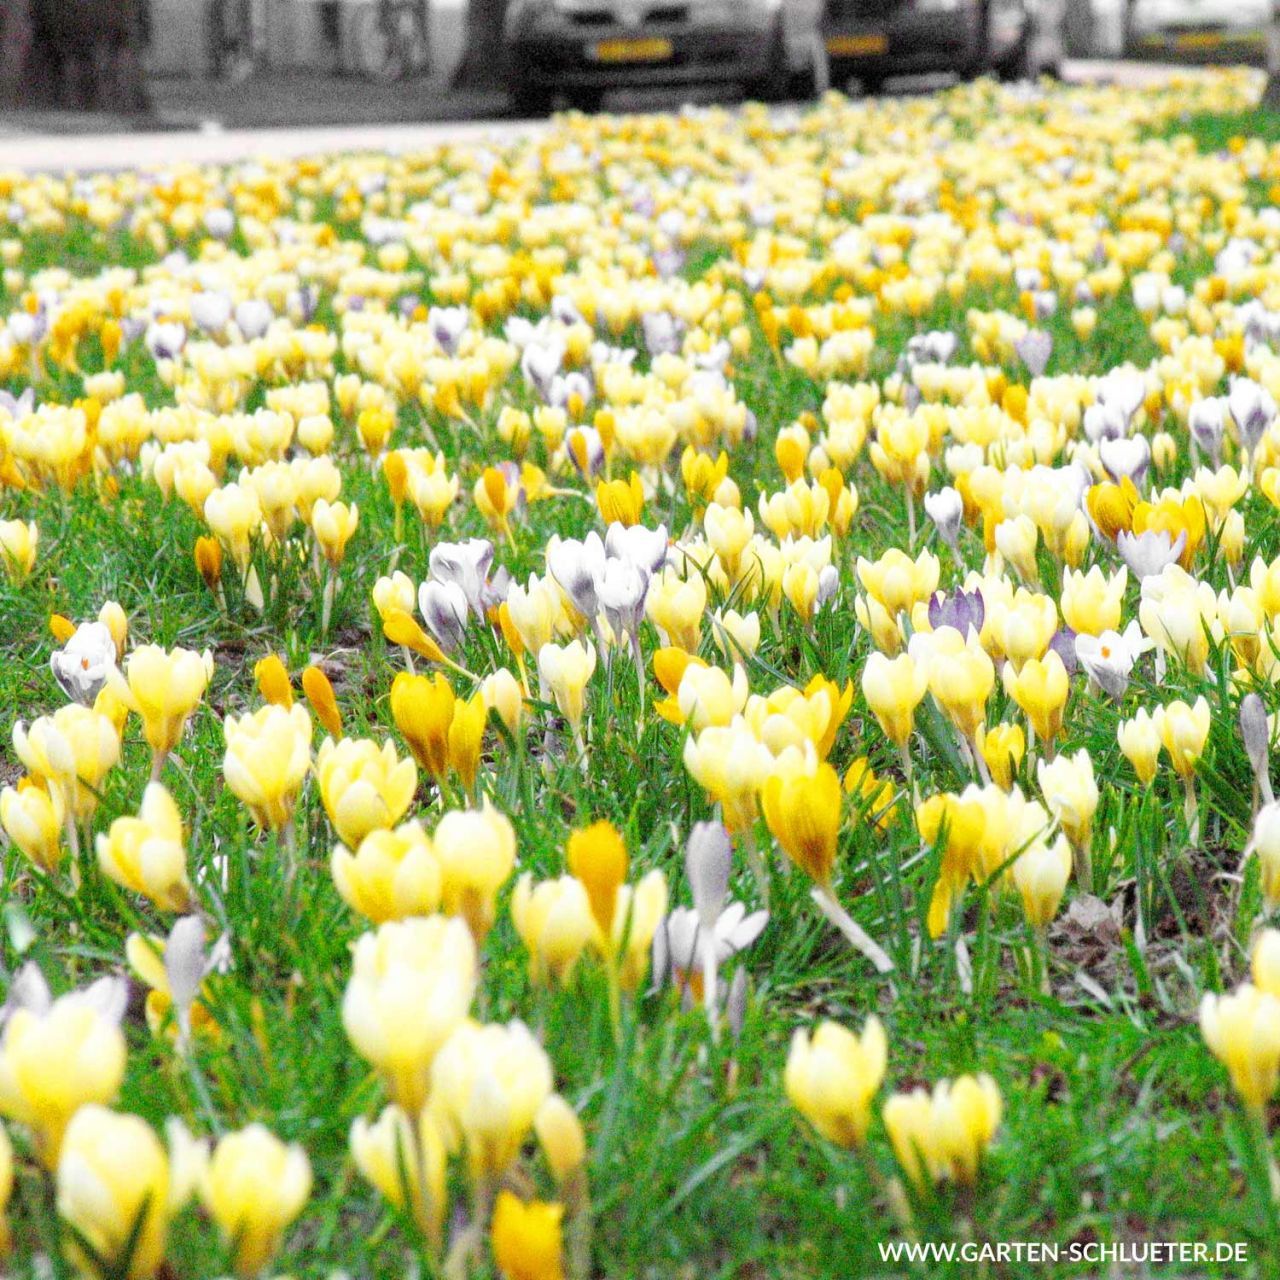 Krokus Mischung 'Yellow - White' - 40 Stück